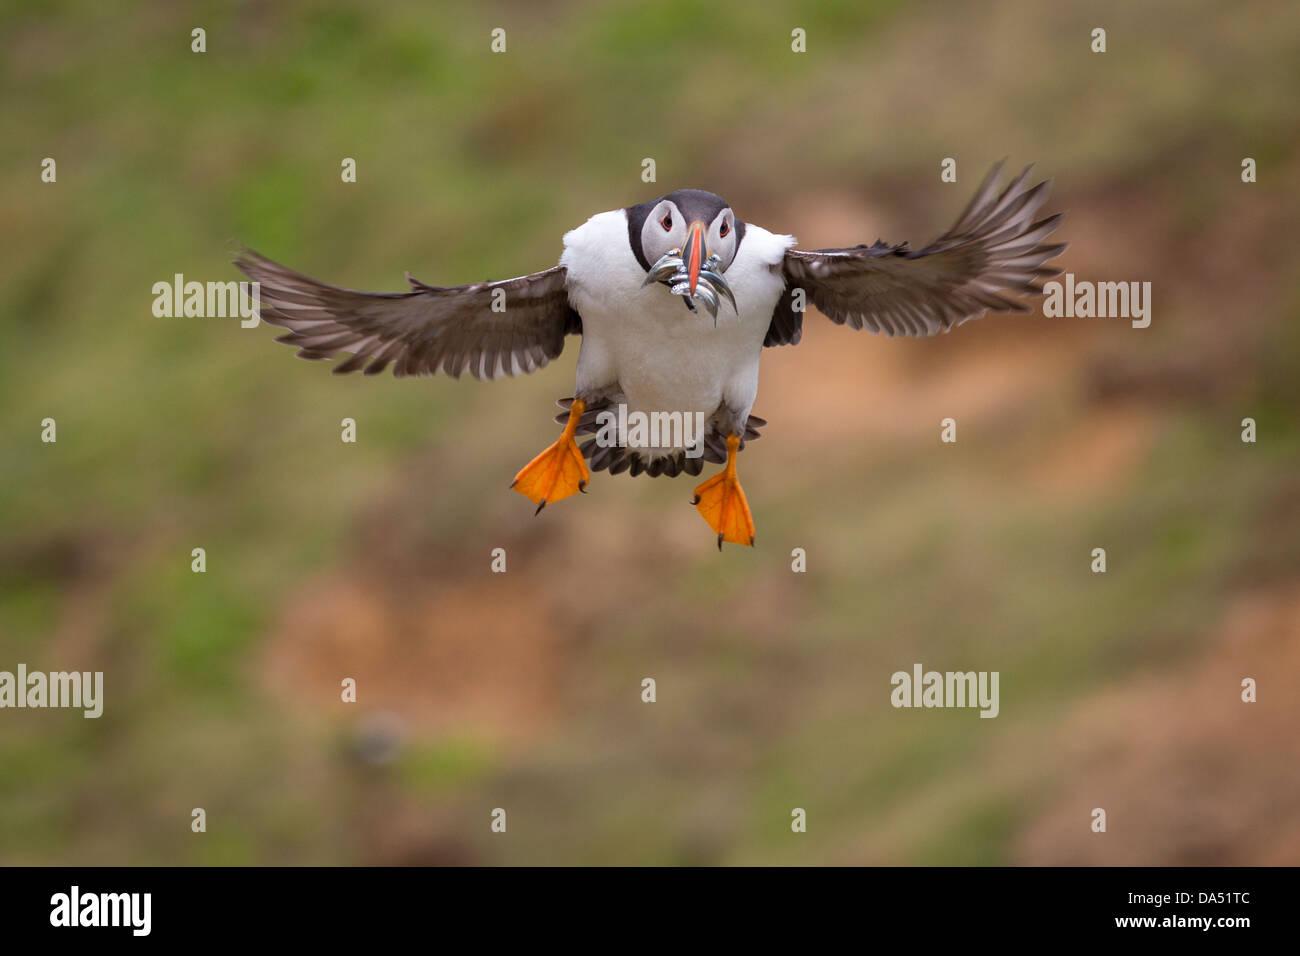 Puffin with sandeels in its beak, landing Stock Photo